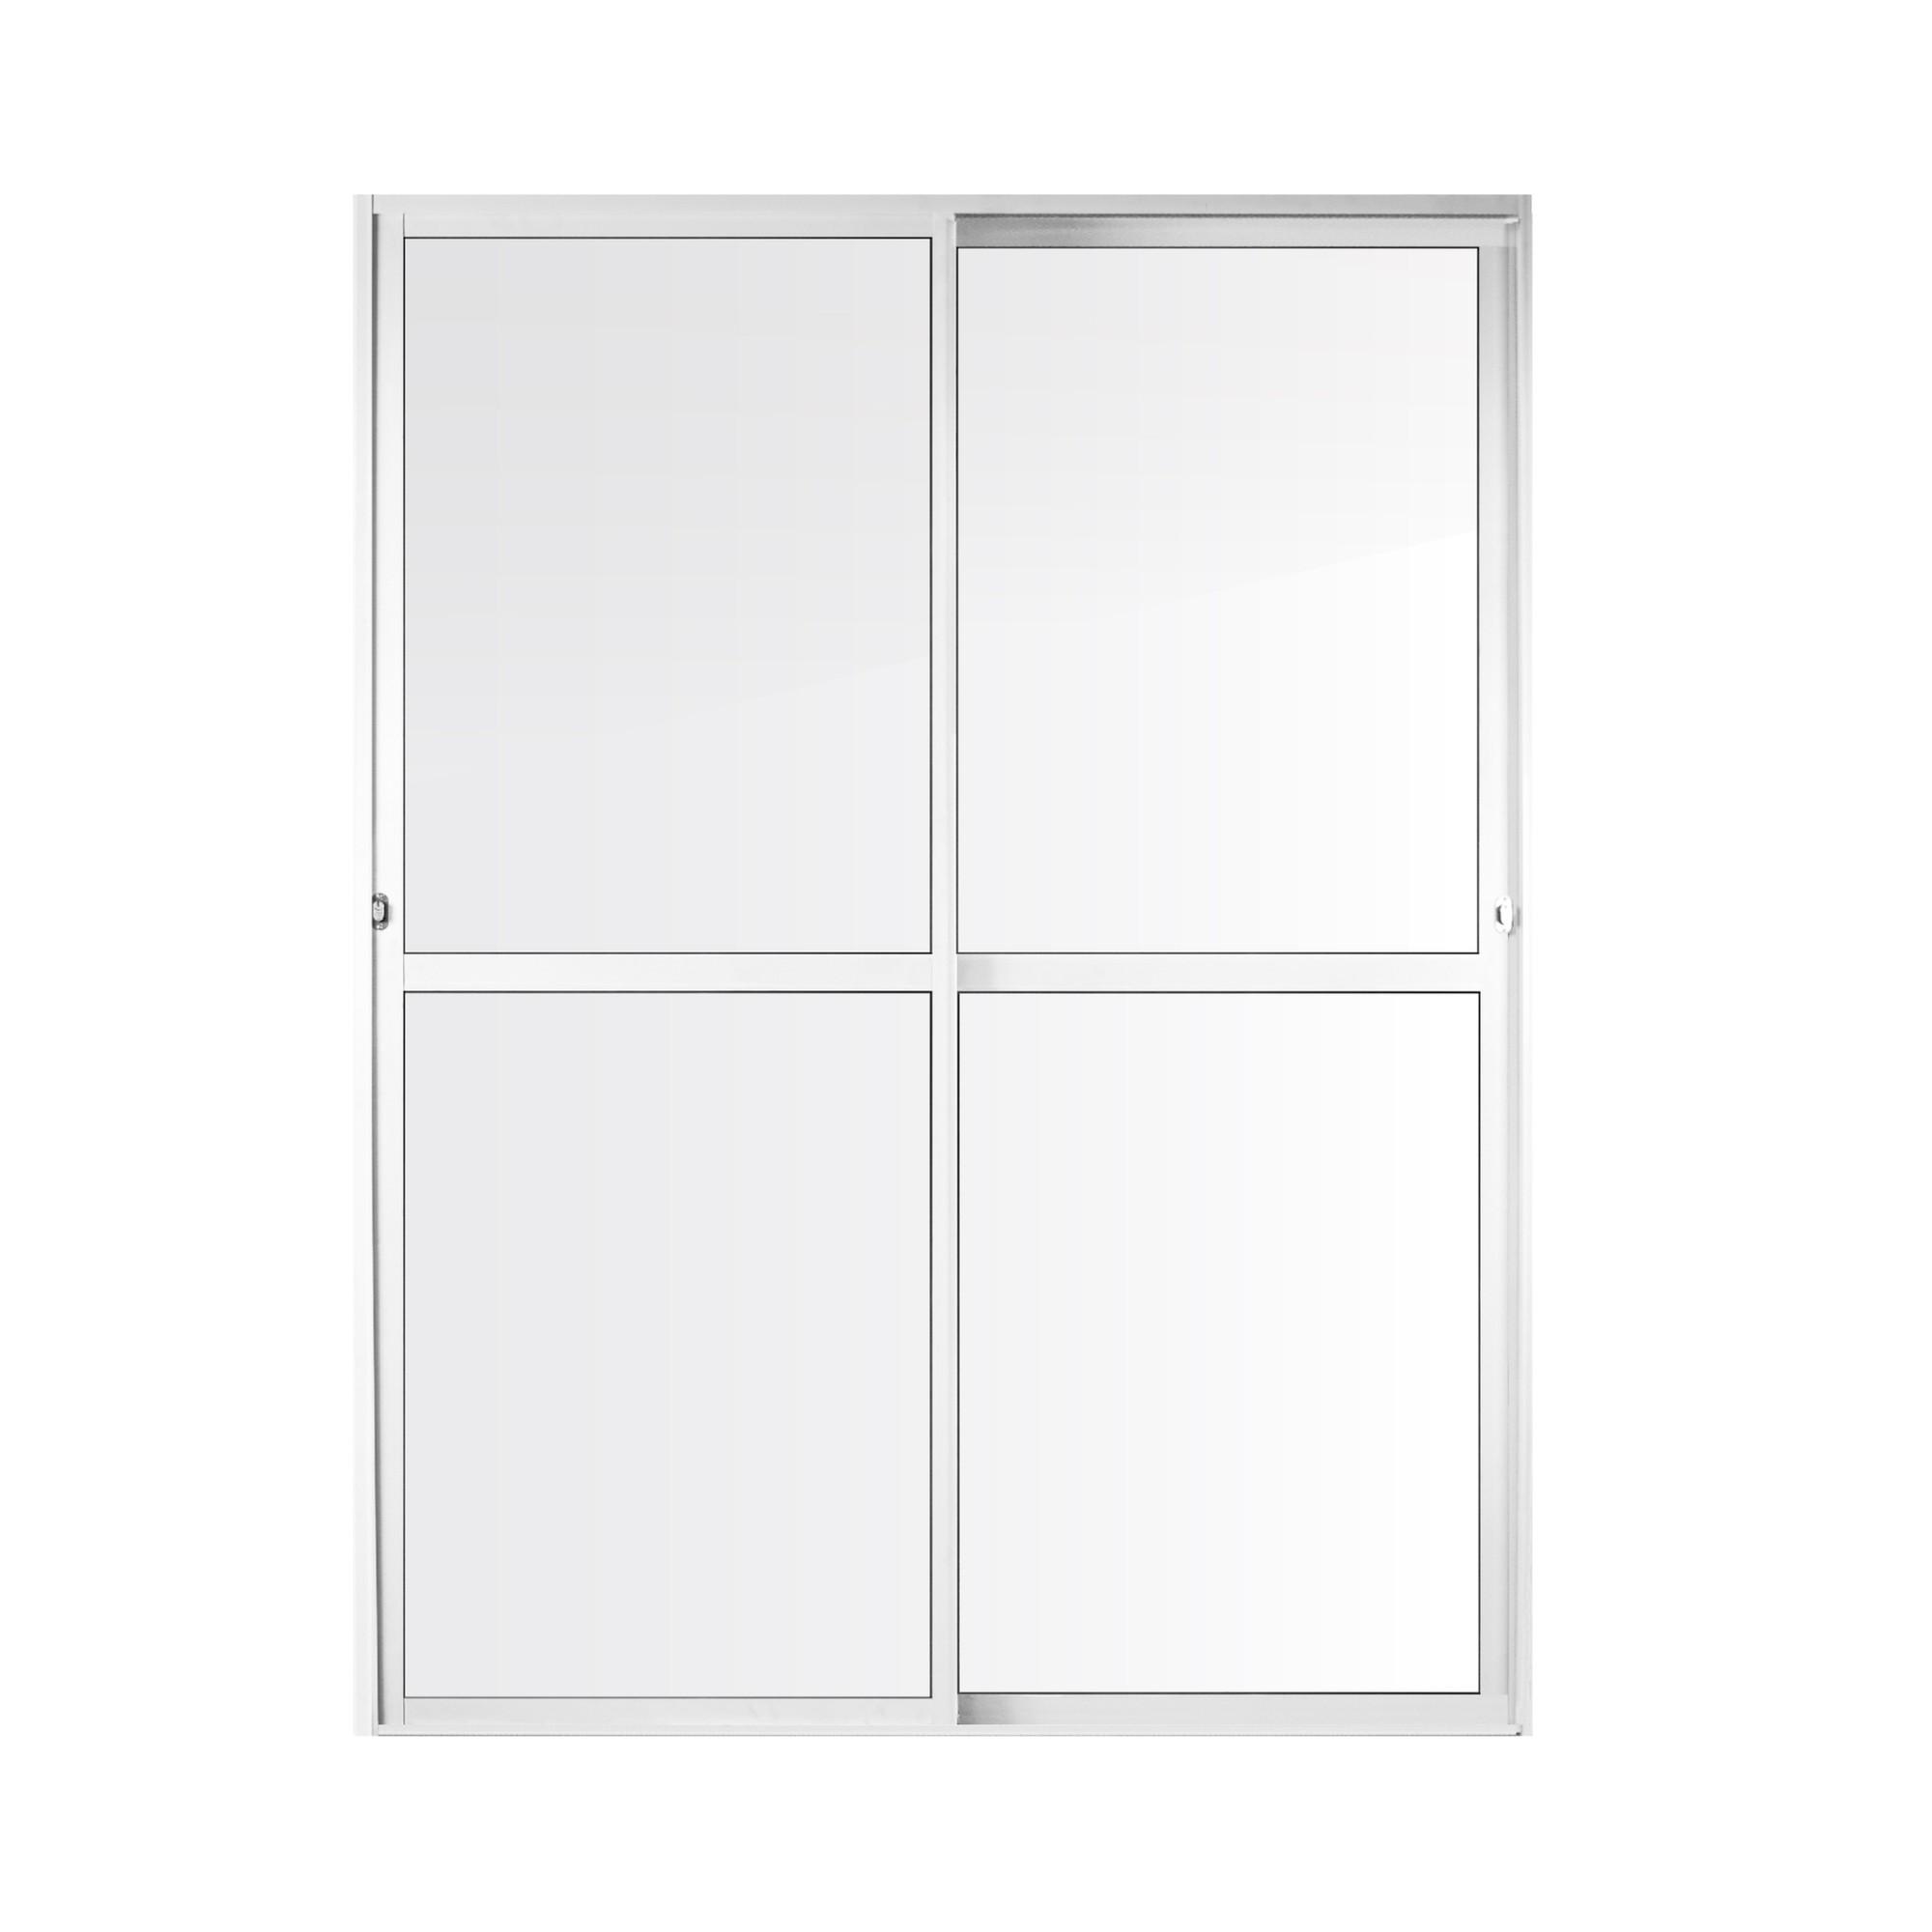 Porta Balcao de Aluminio 2 Folhas 210x160cm Branca Metalflex - Aluvid